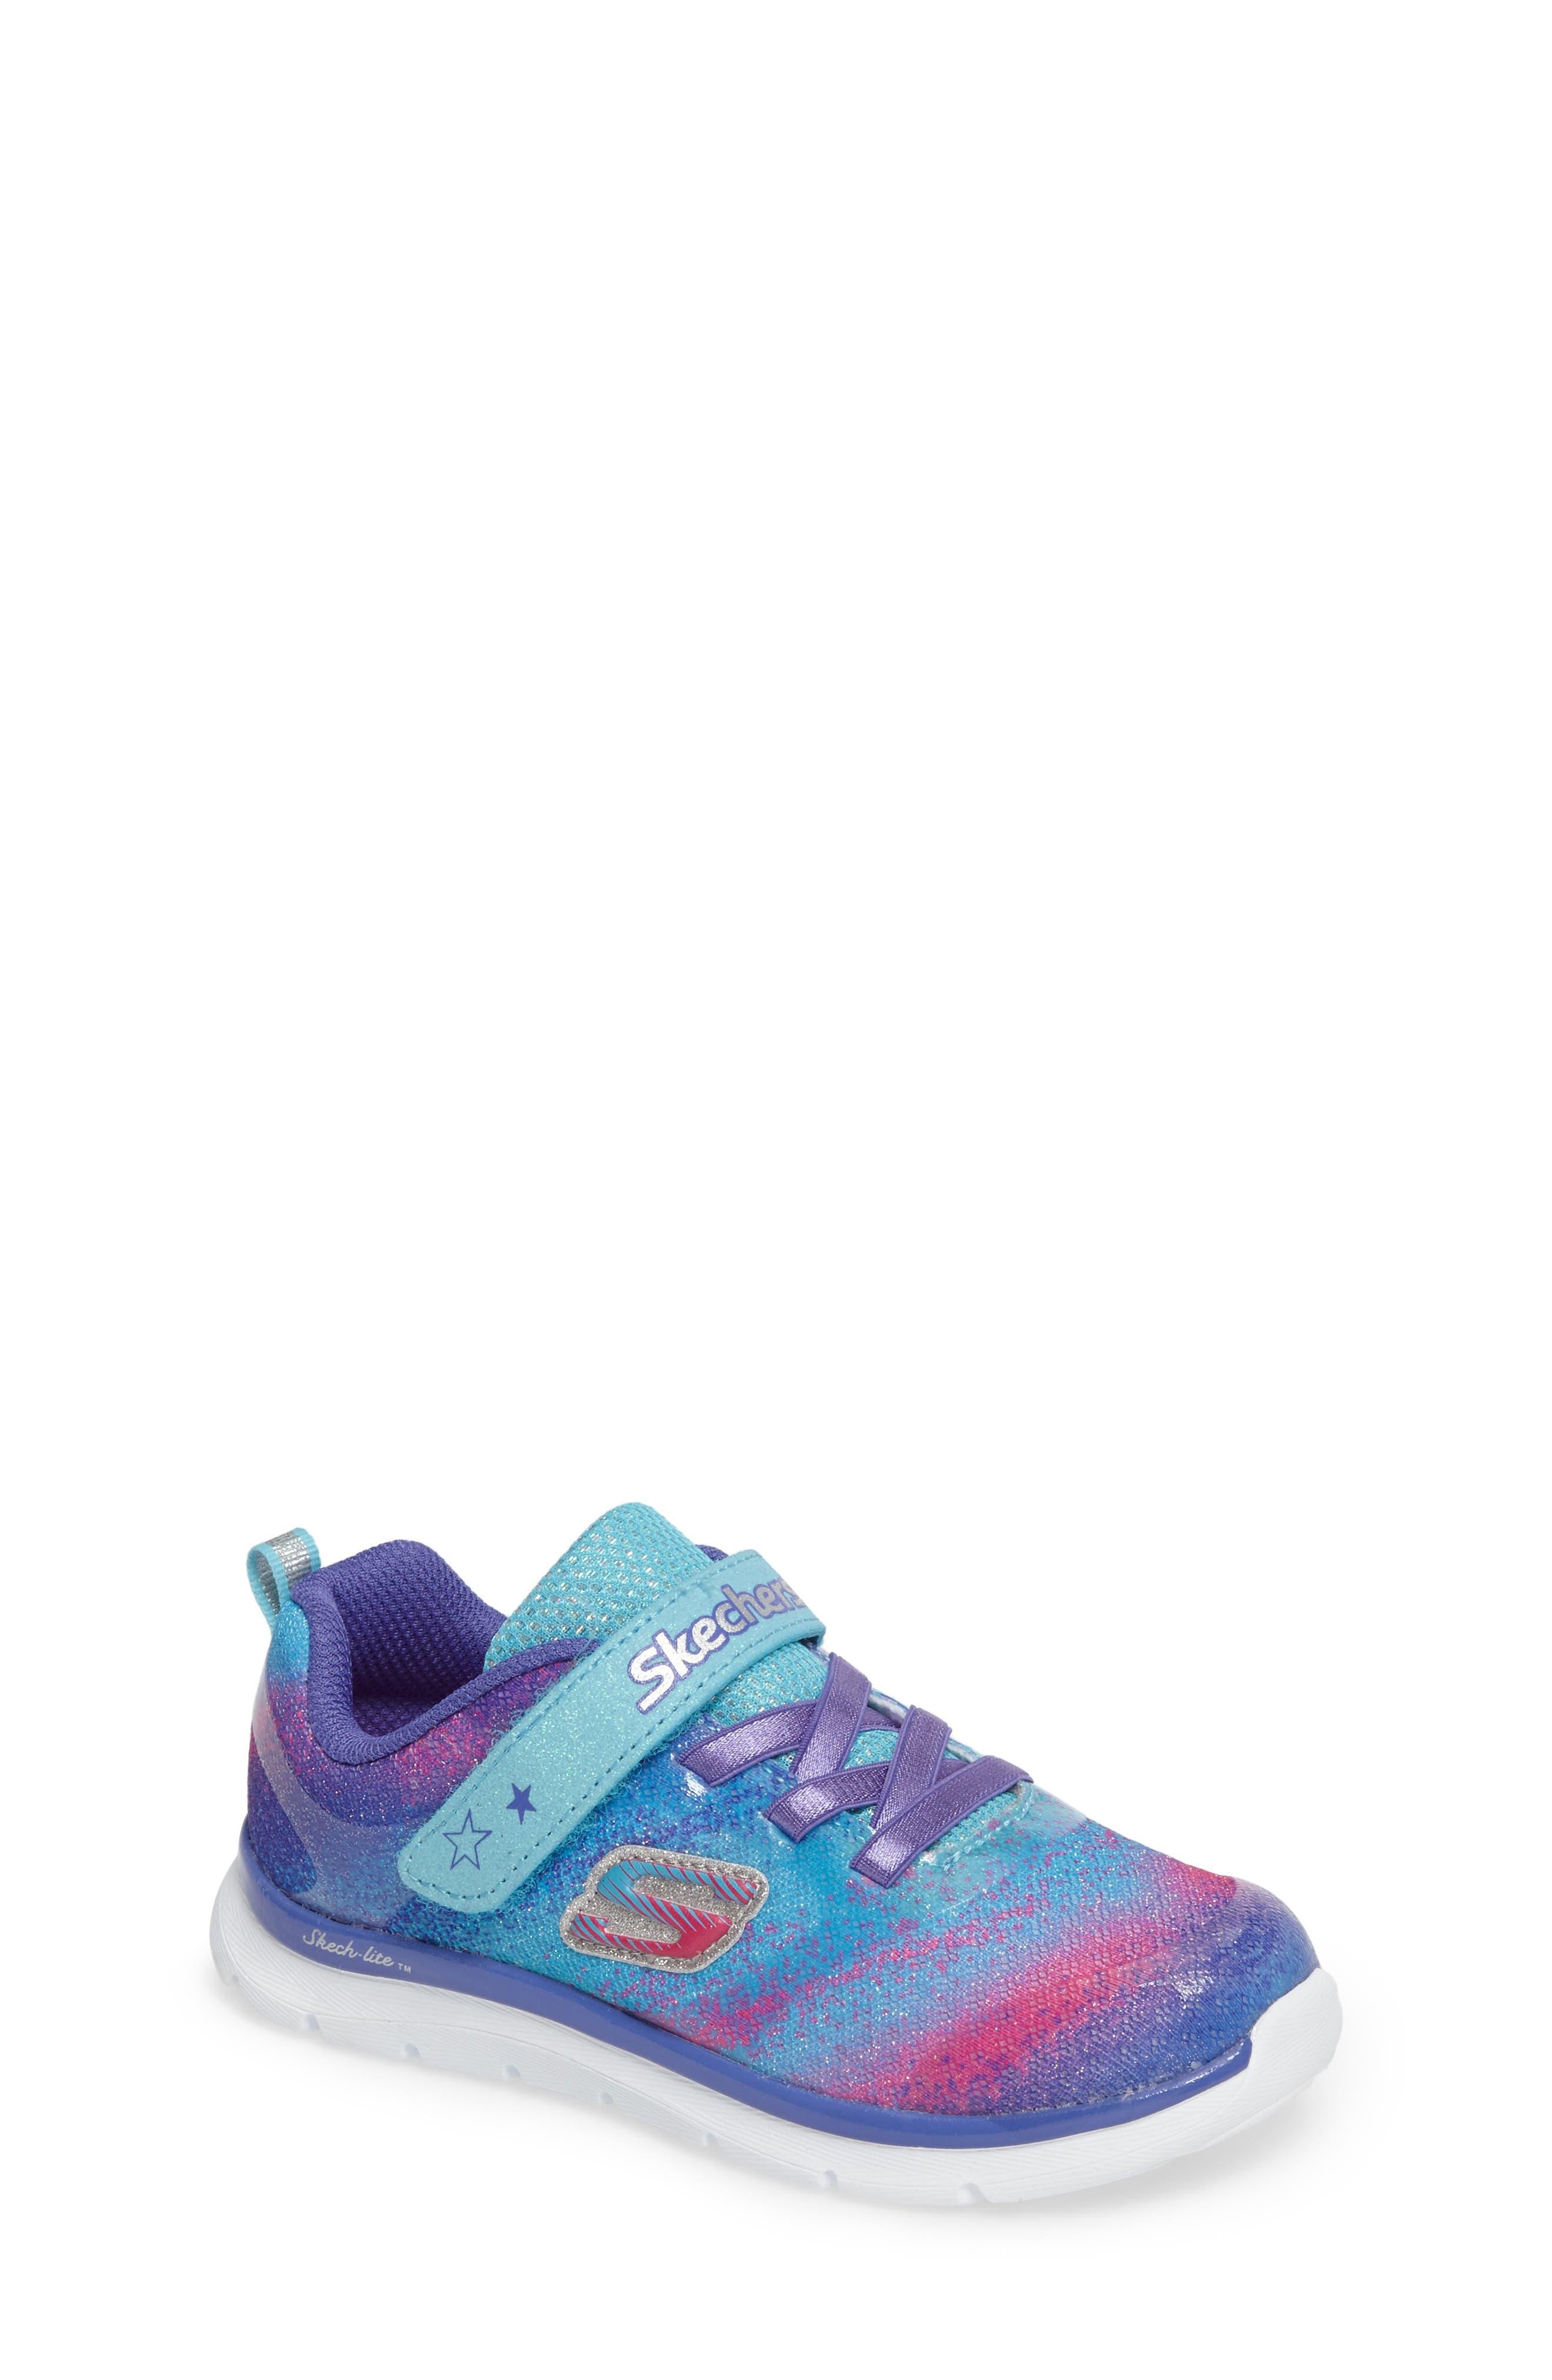 Skech-Lite Colorful Cutie Sneaker,                             Main thumbnail 1, color,                             400